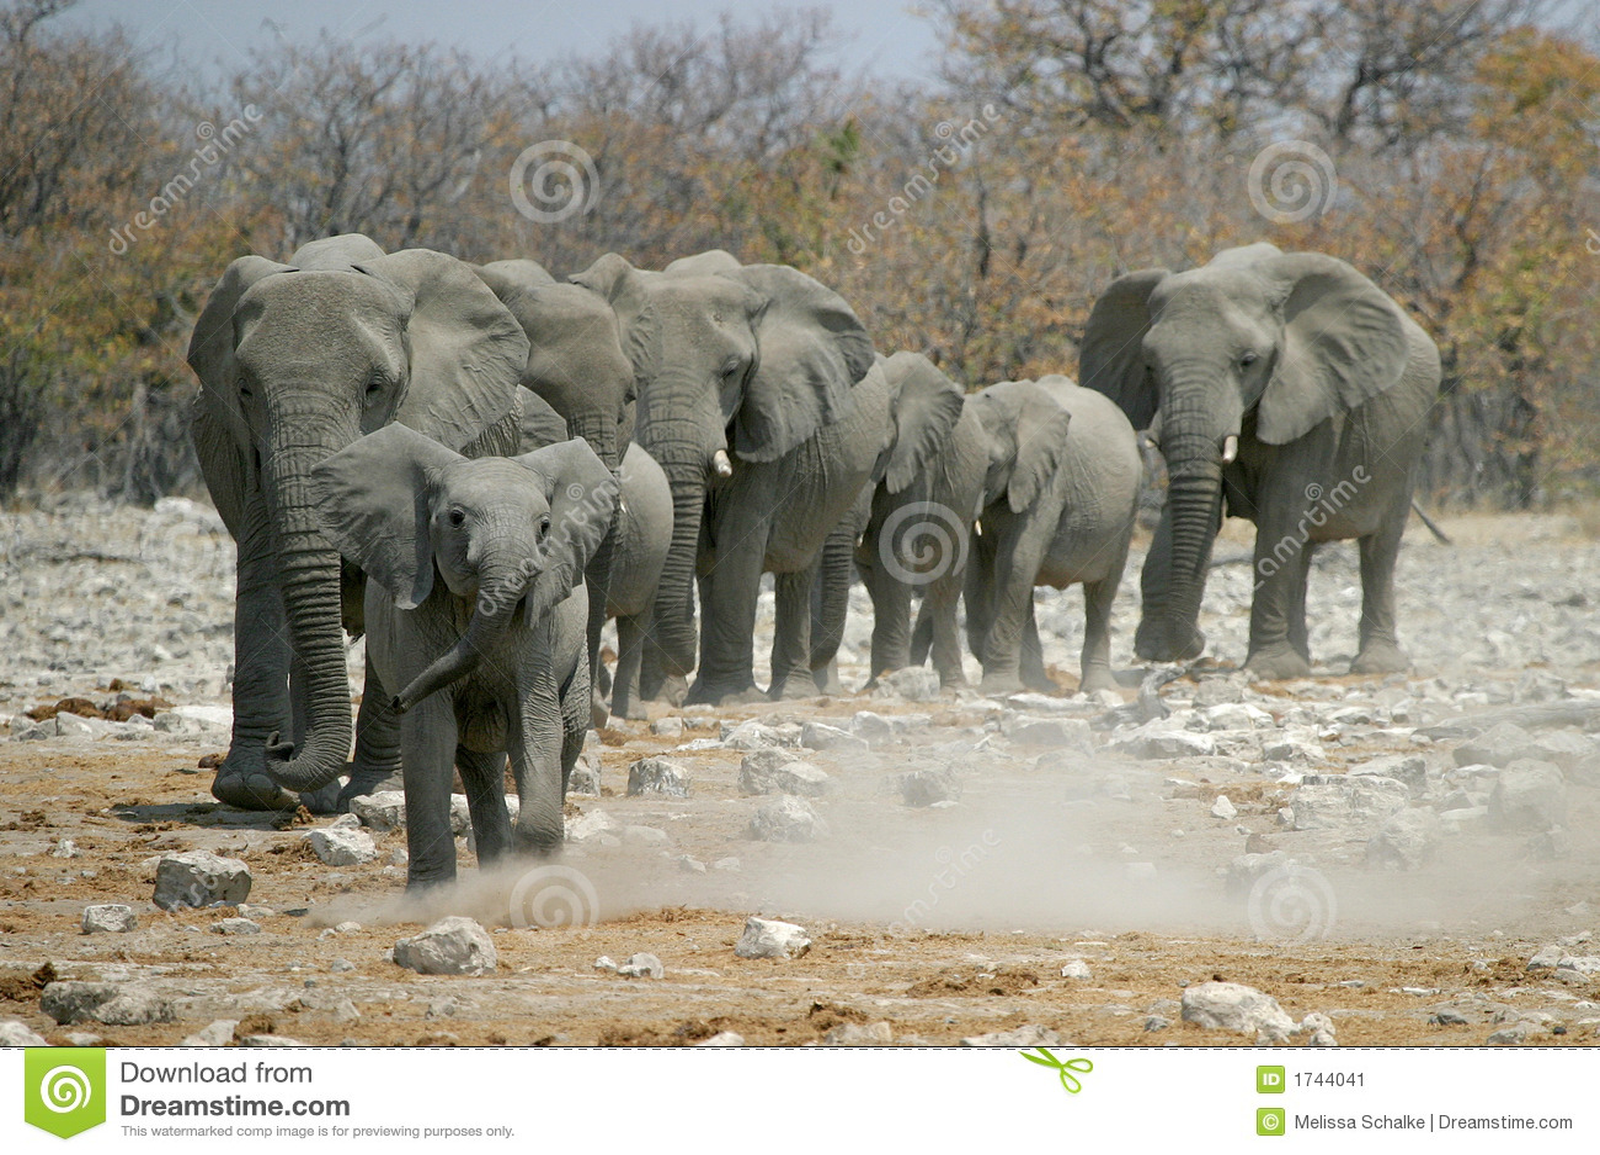 Kleine Elefanten, Welche Die Herde Führen Stockbild - Bild: 1744041   {Herde 35}